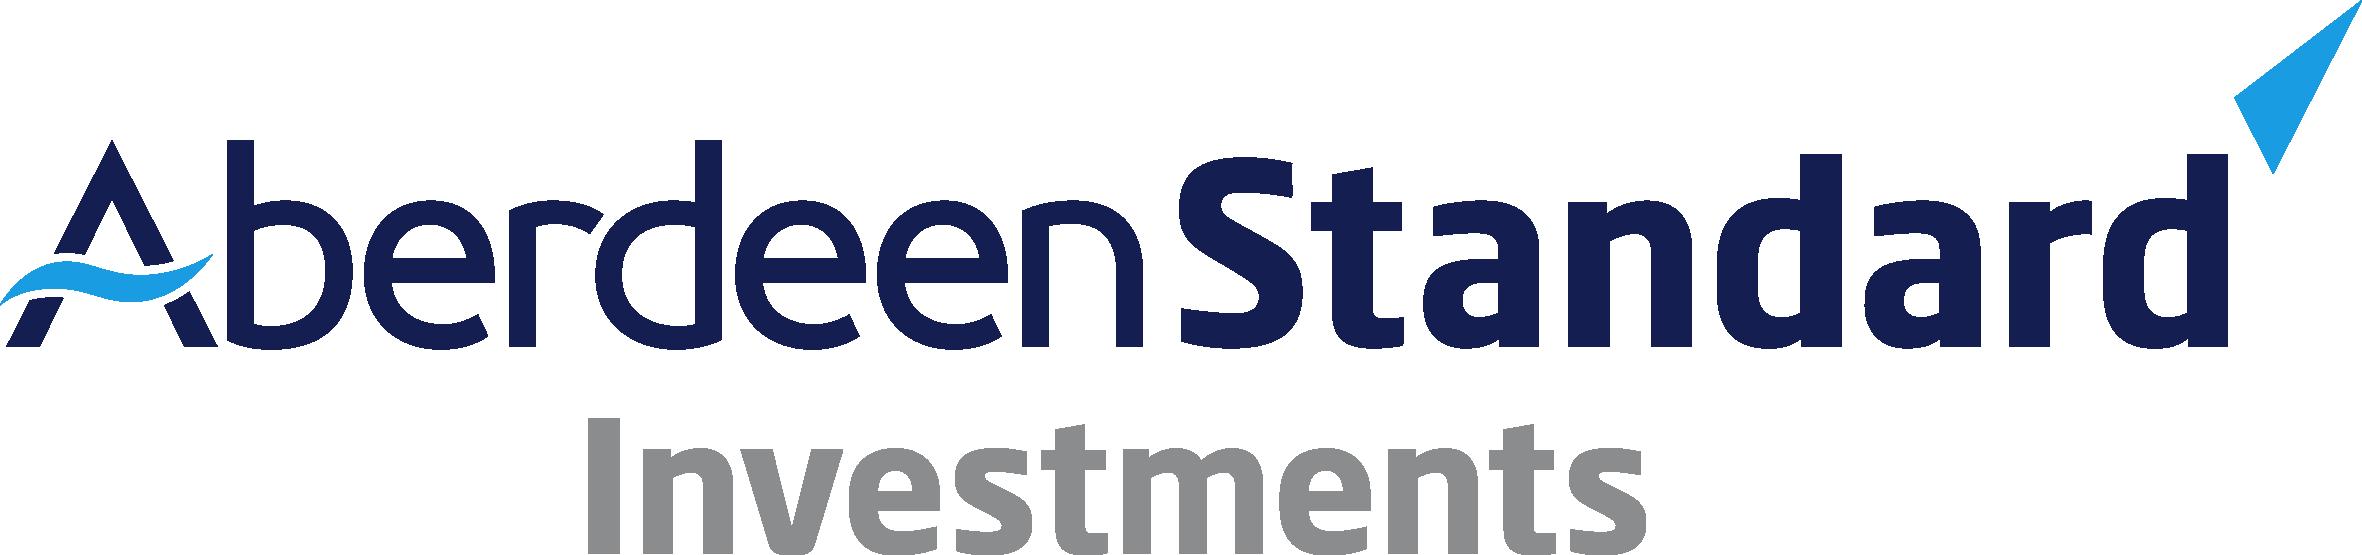 Aberdeen Japan Investment Trust Plc Logo